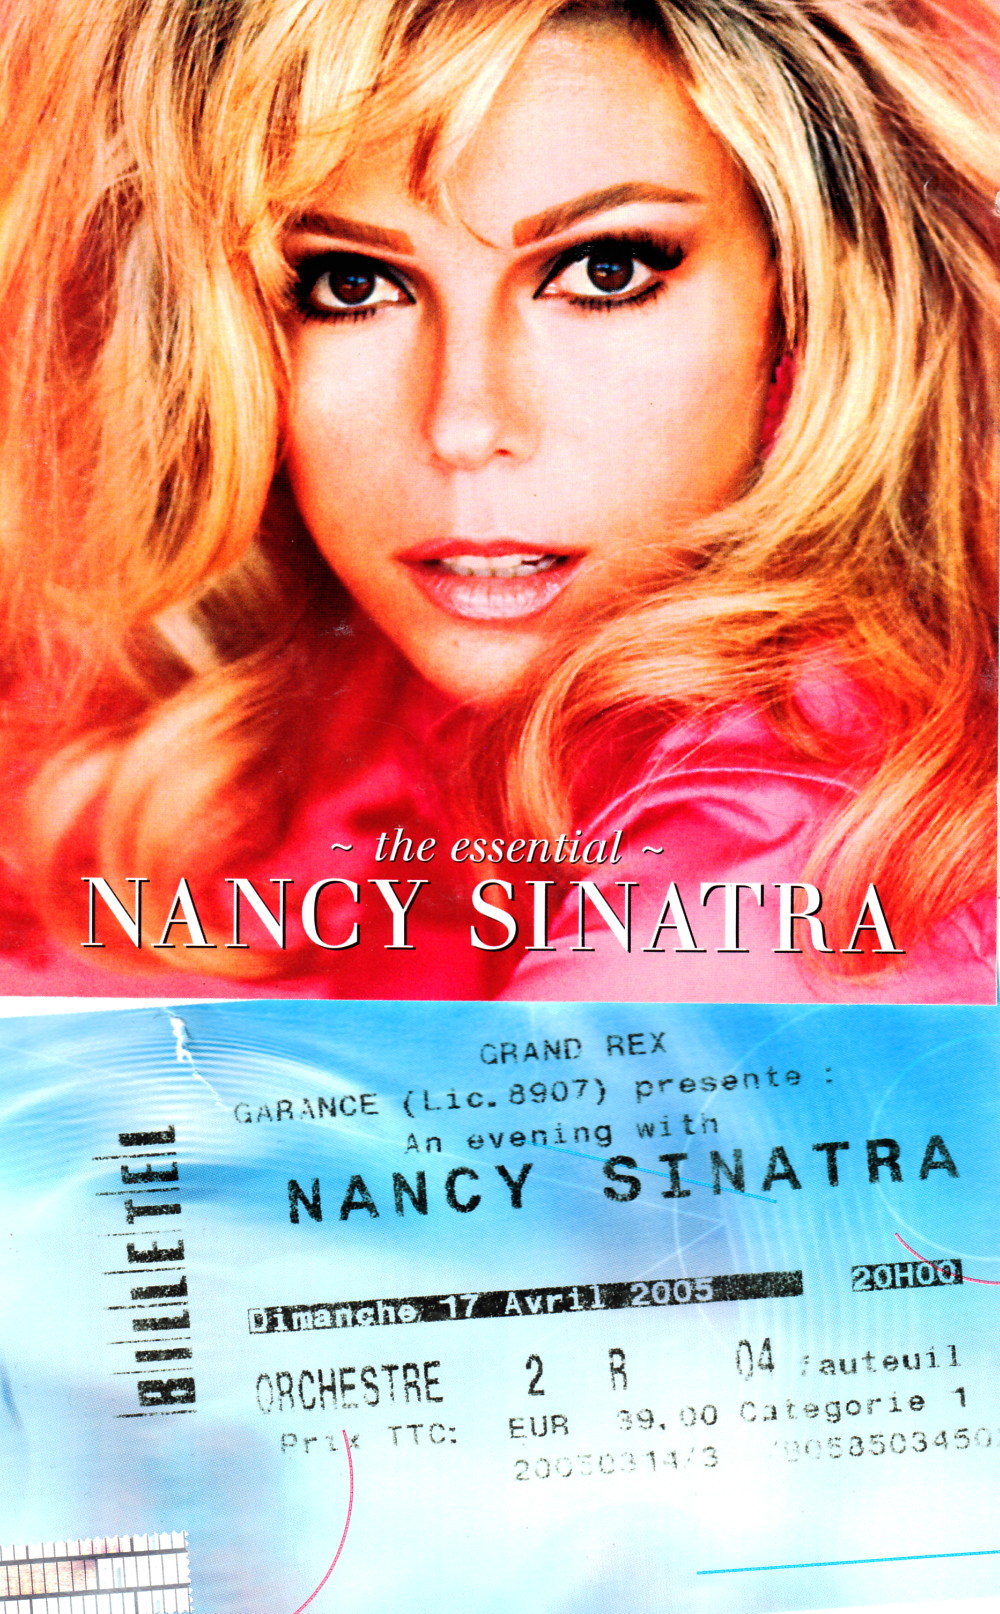 """An Evening With NANCY SINATRA"" 17/04/2005 Grand Rex (Paris) : compte rendu (review)  16011208074820773813889615"